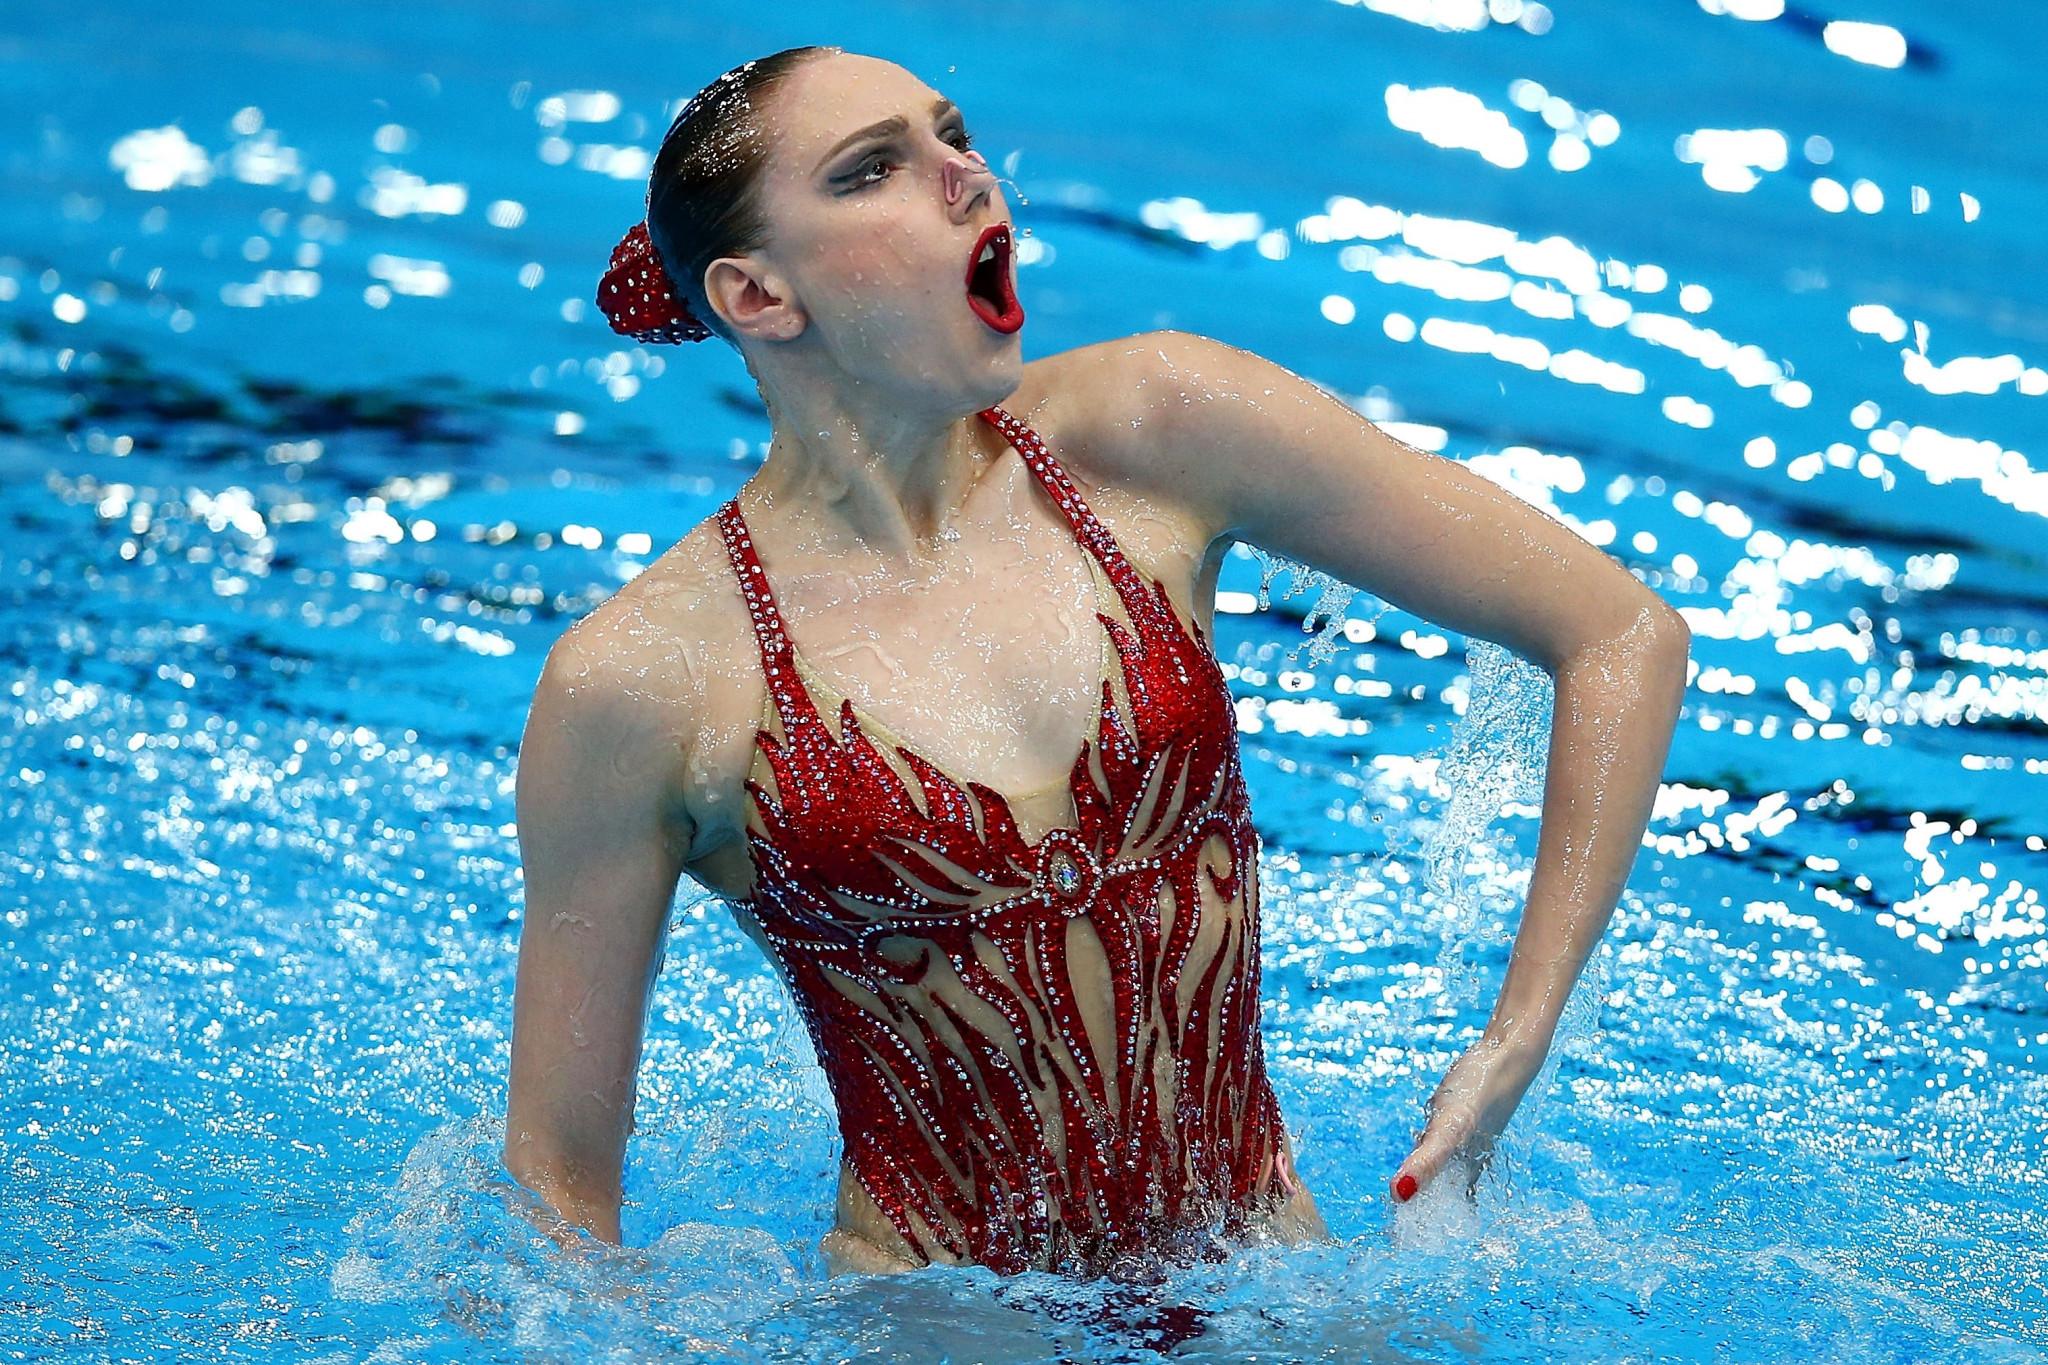 Svetlana Kolesnichenko leads the Russian artistic swimming team in Budapest ©Getty Images